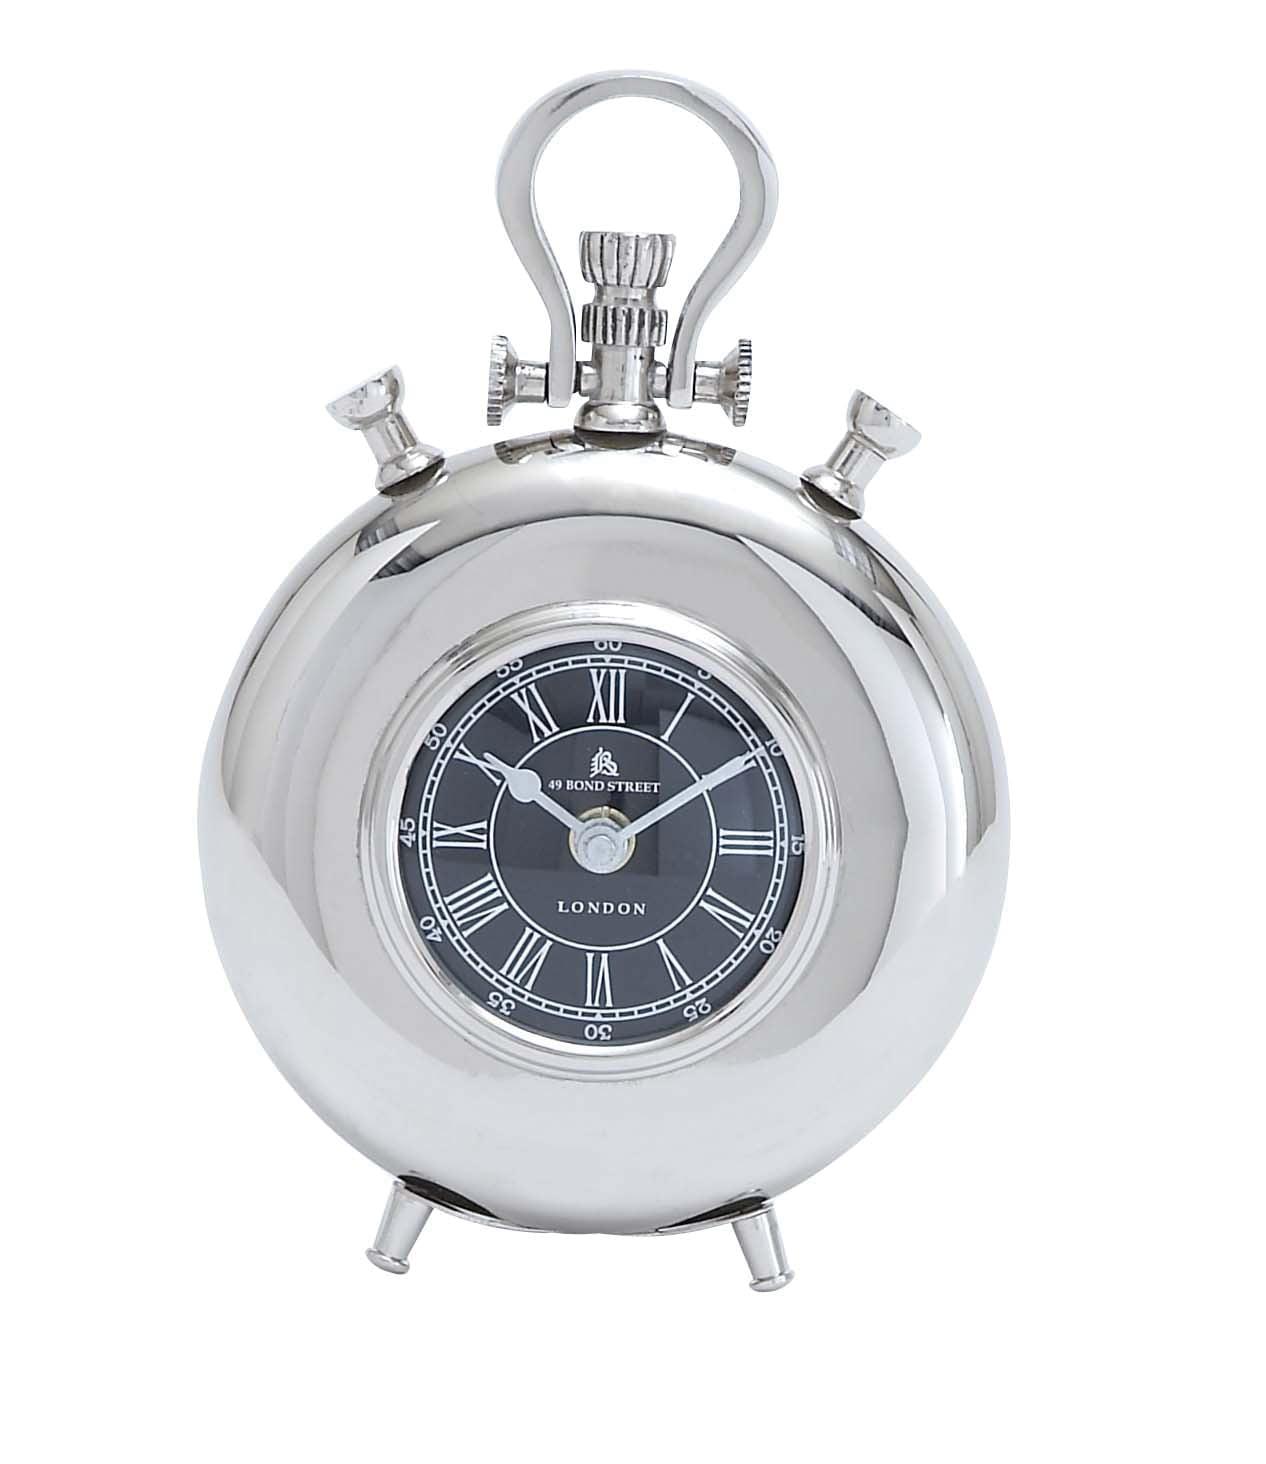 Nickel Plated Table Clock by Benzara